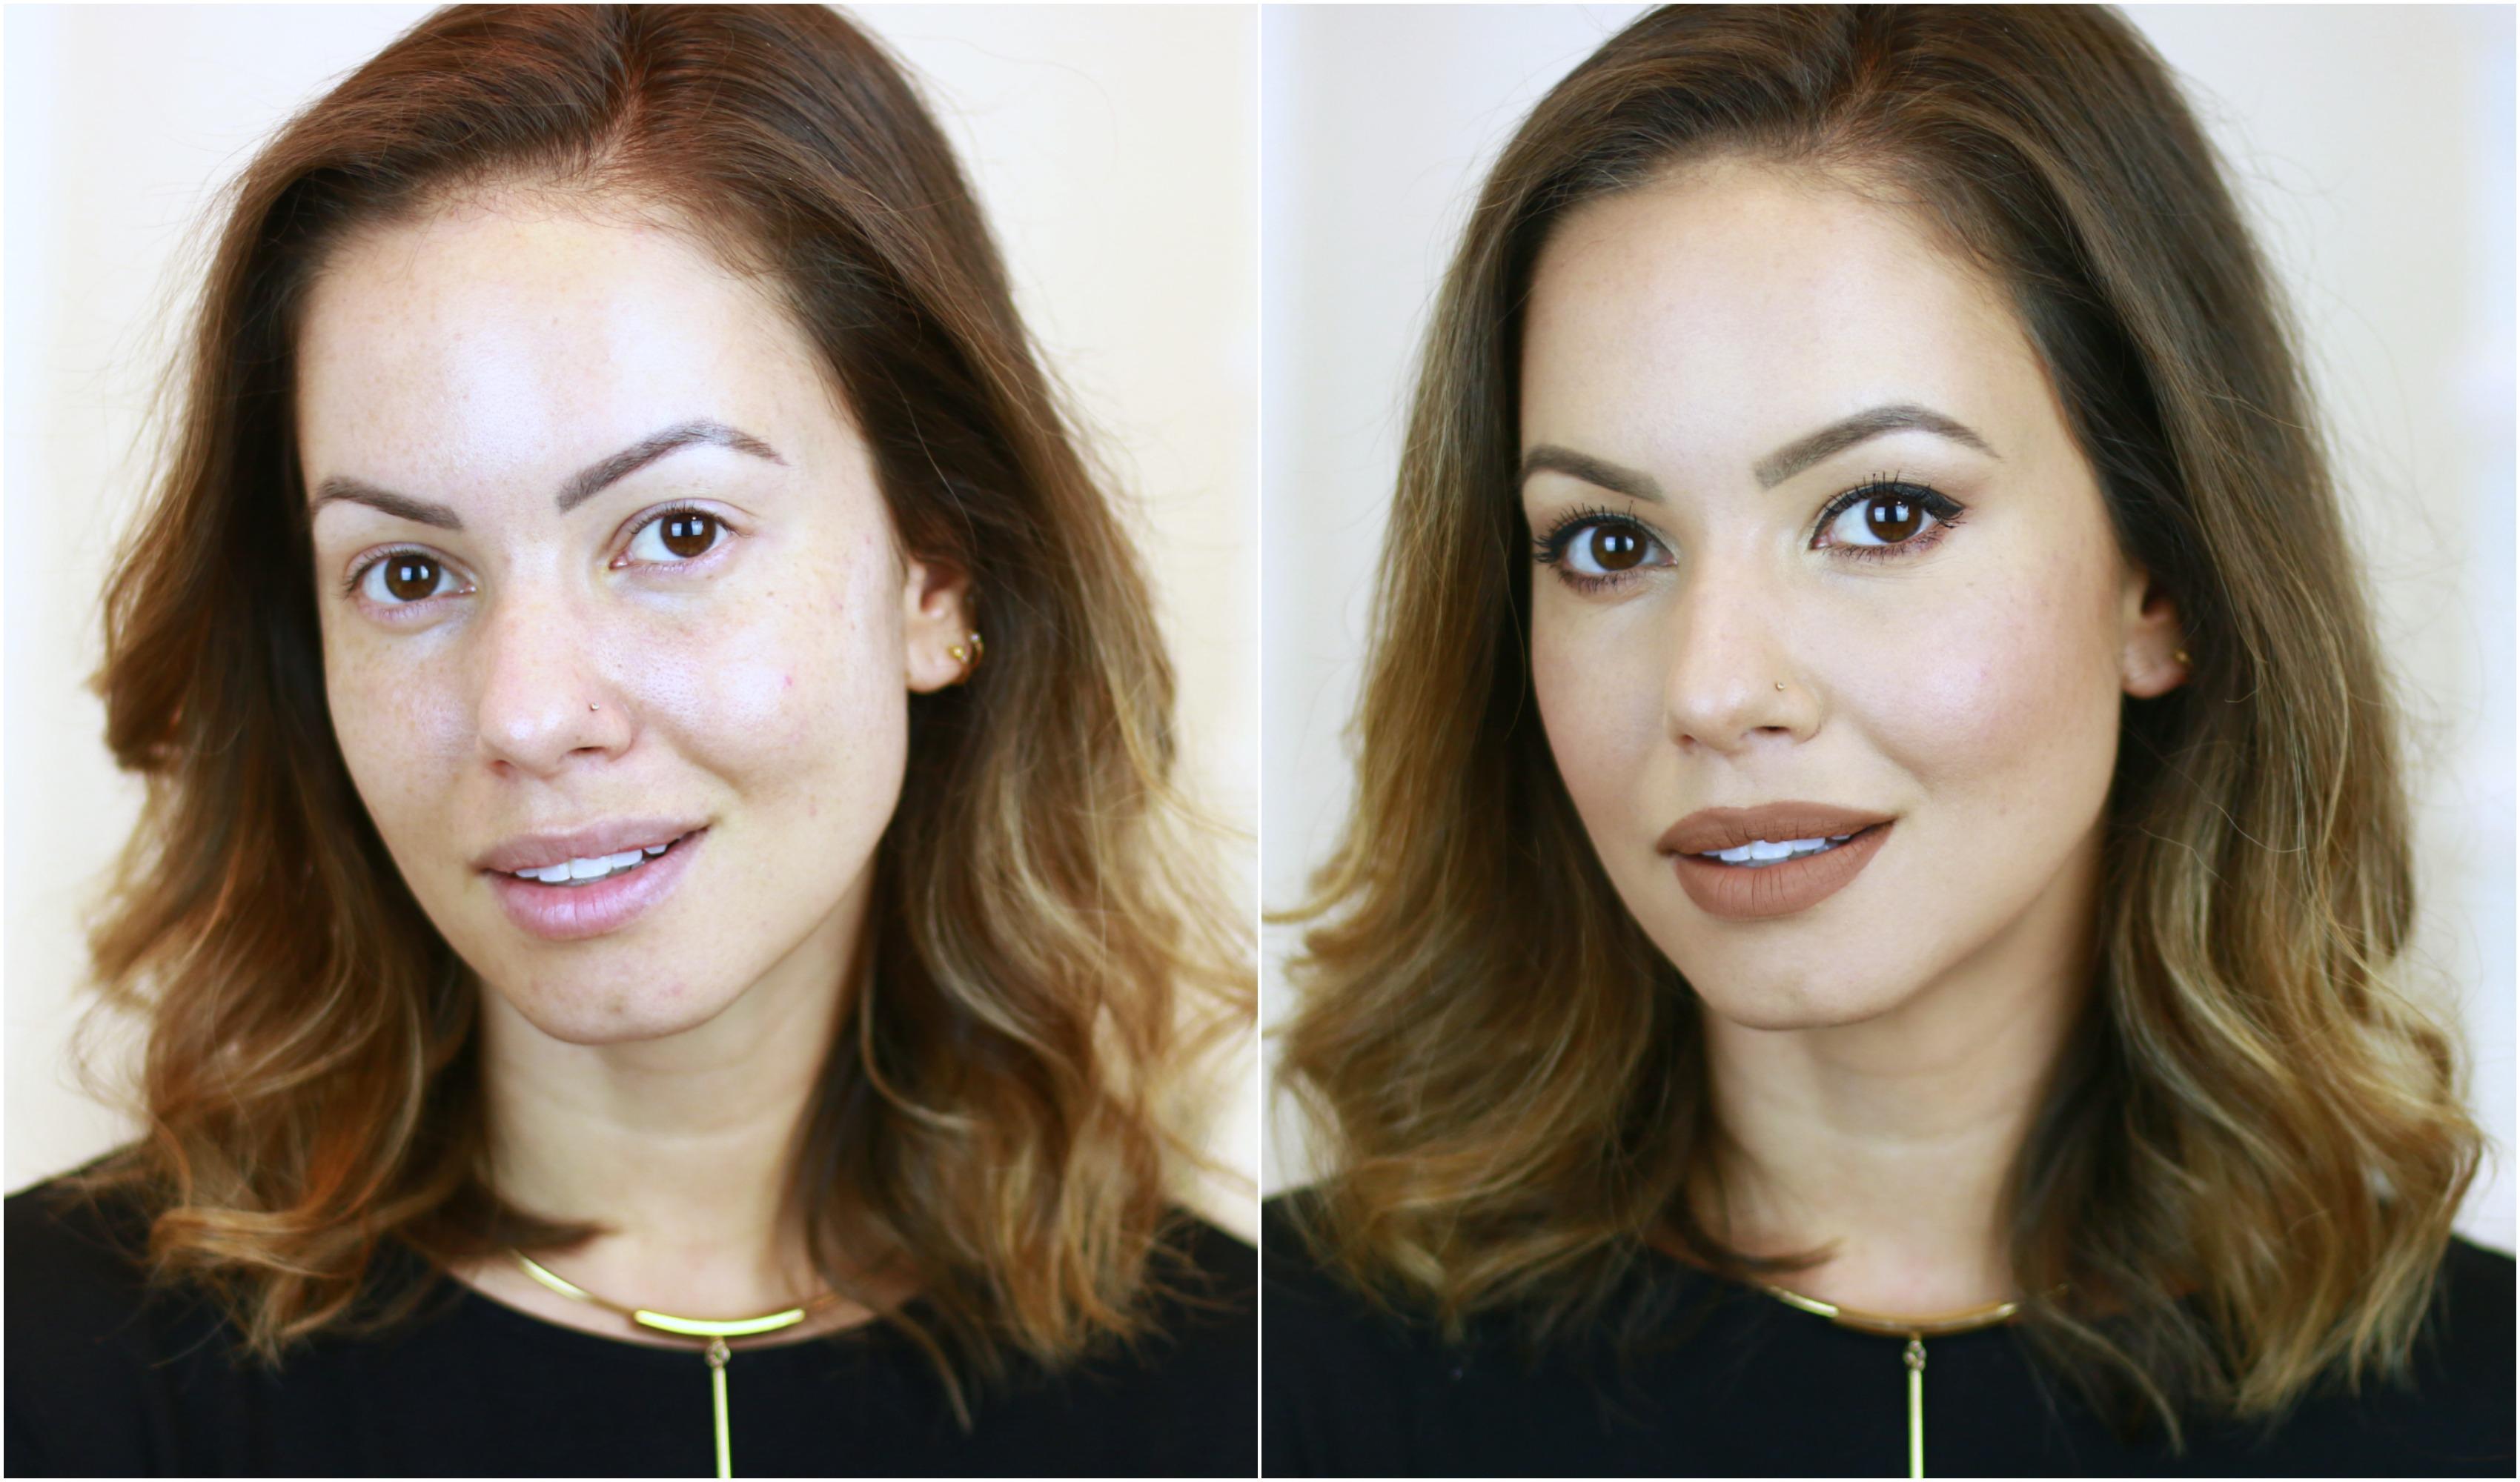 juliana-goes-maquiagem-basica-antes-depois